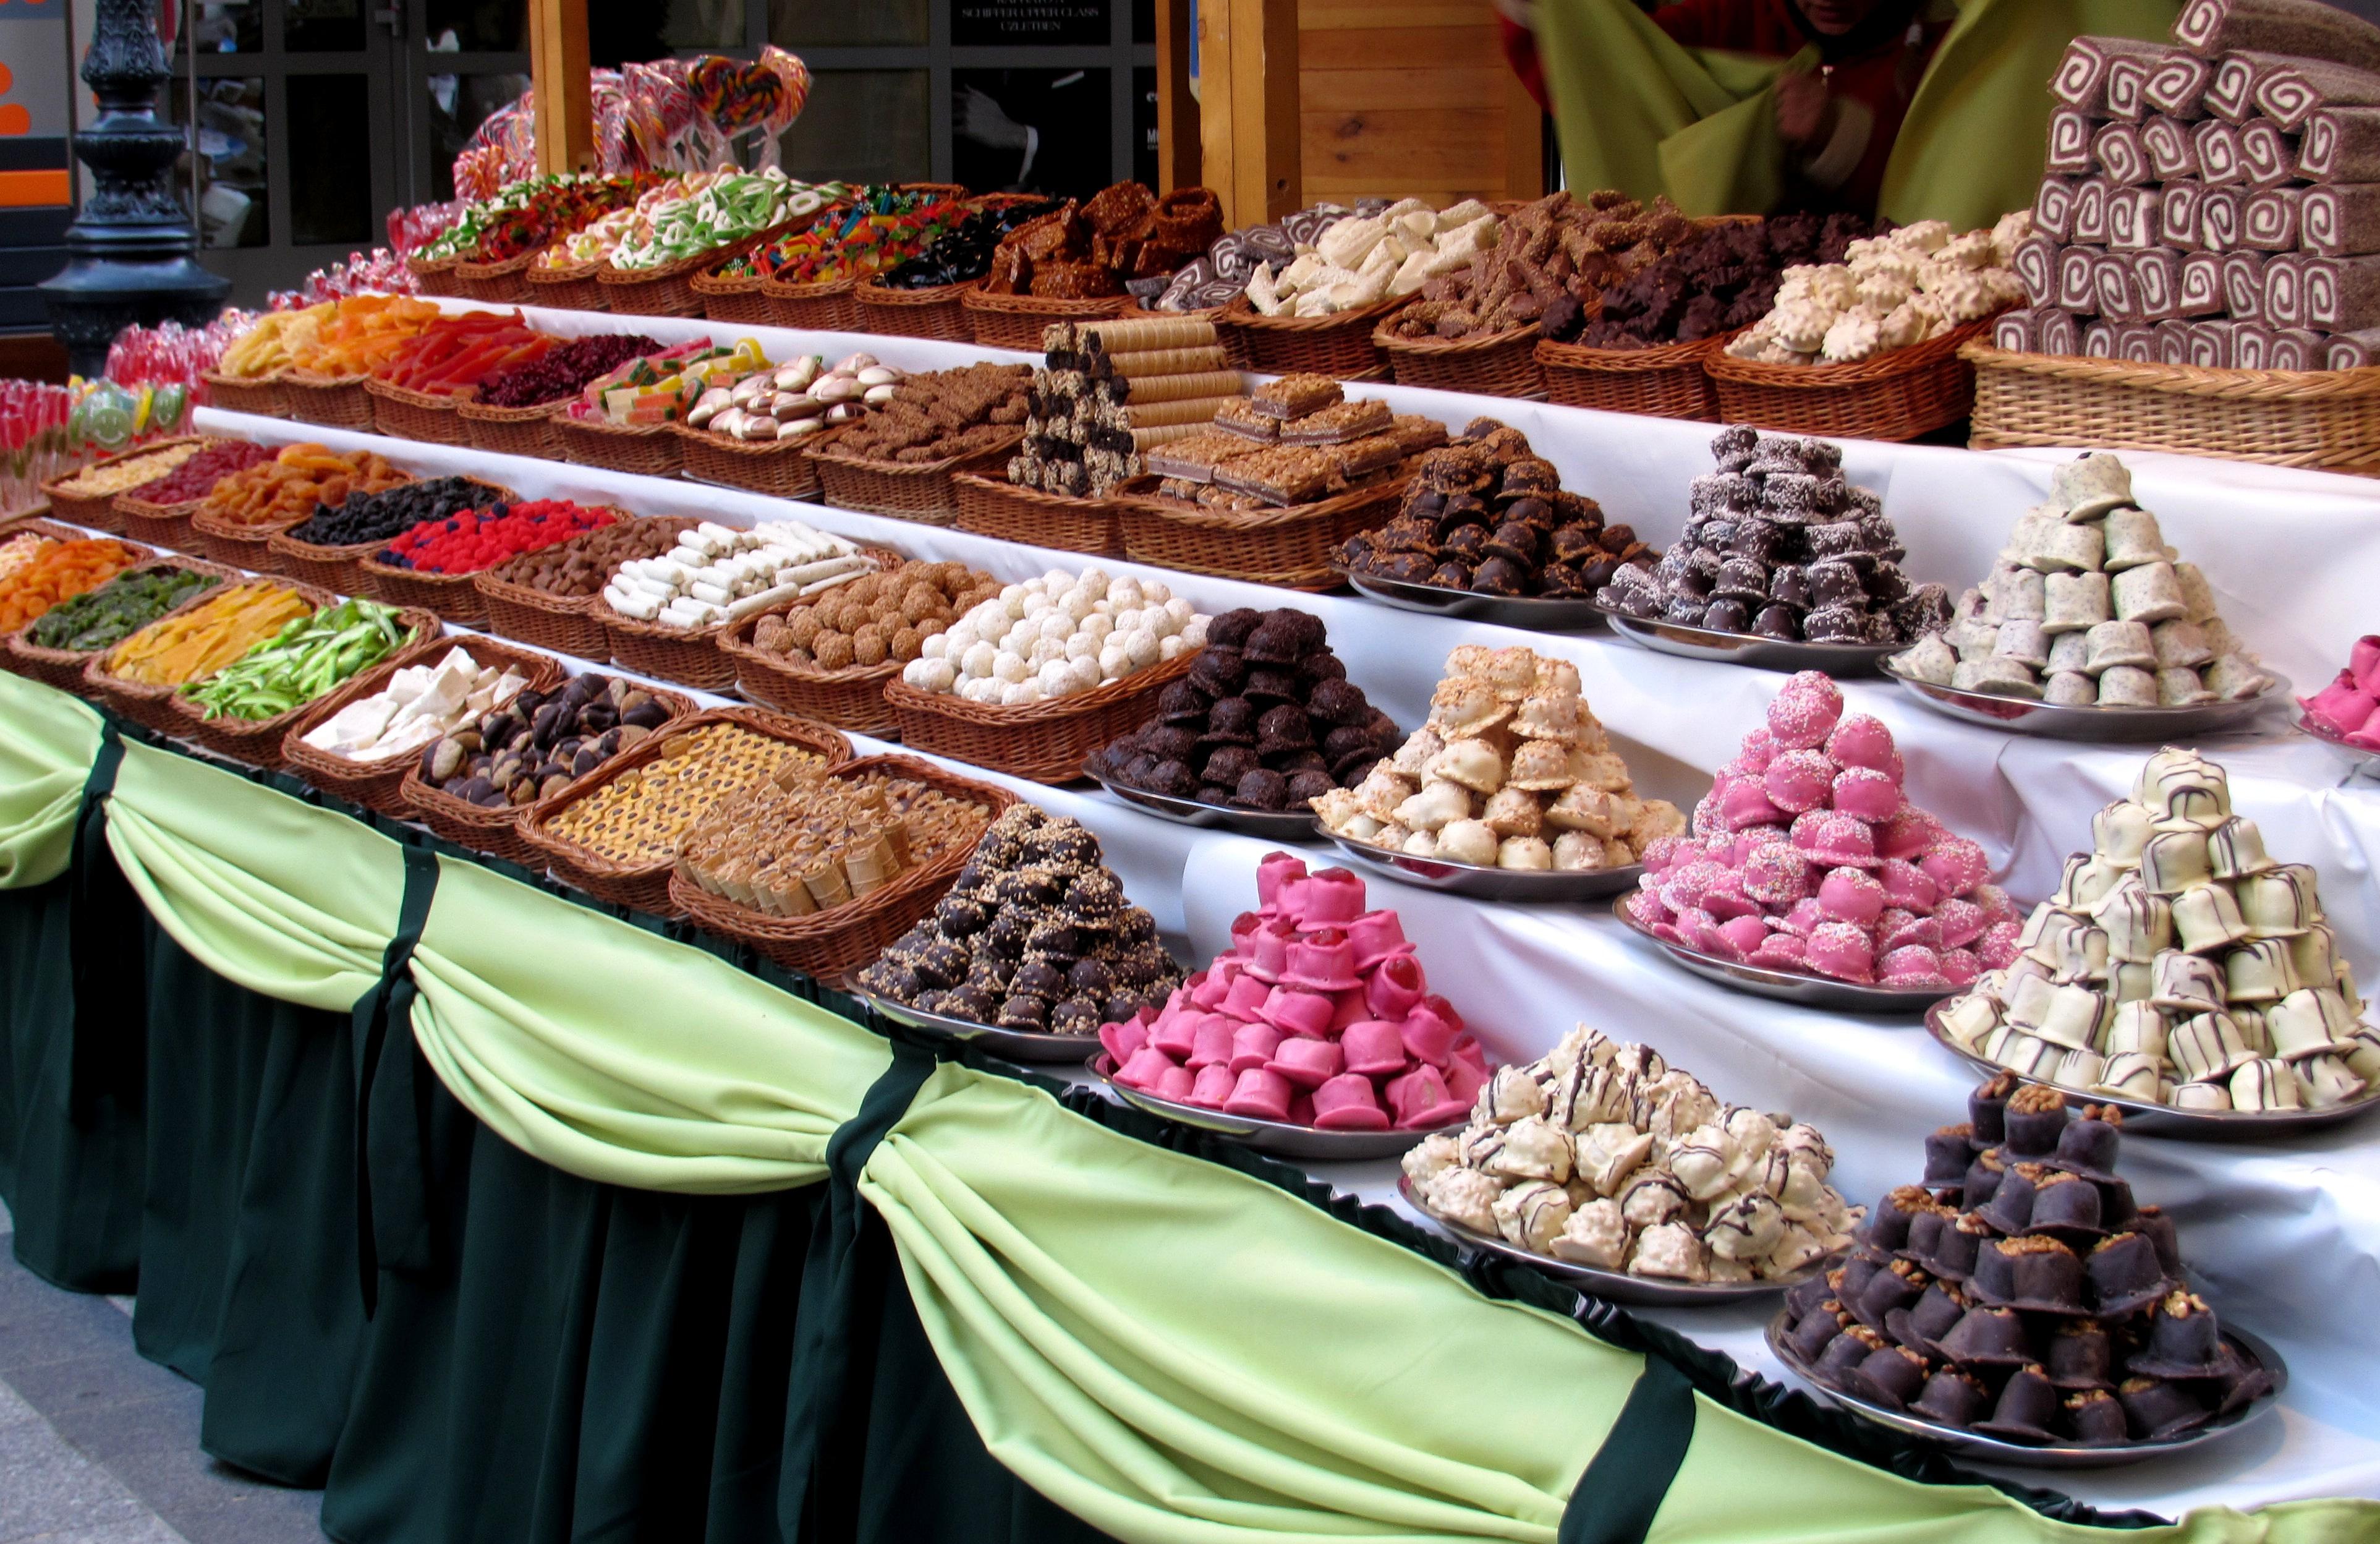 Budapest Christmas Market Food Stalls